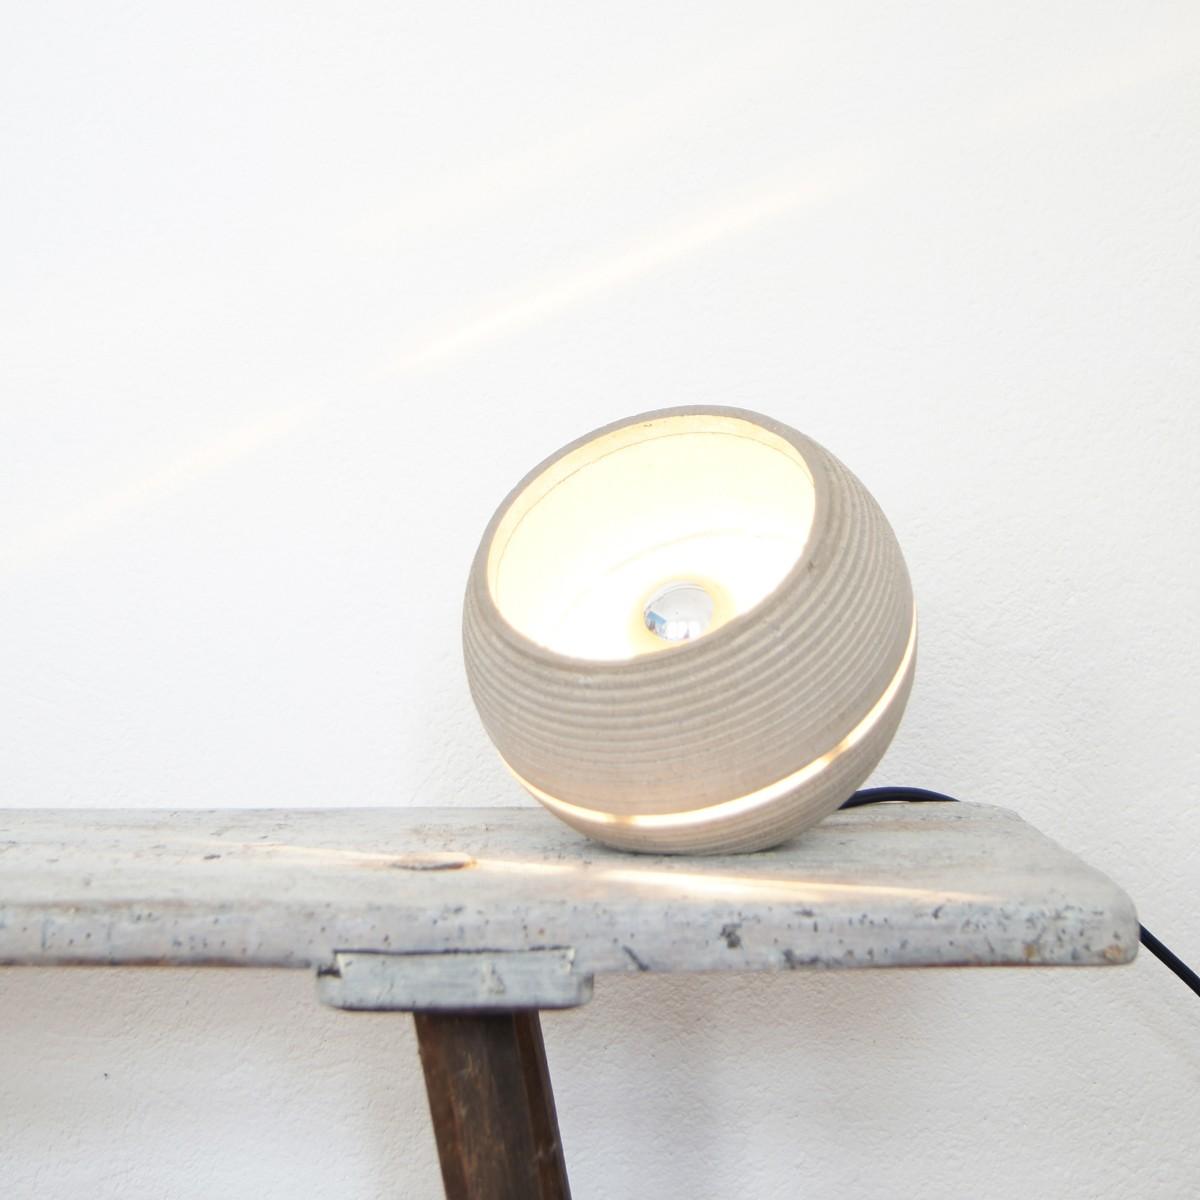 nminus1 beton lightbeam stehlampe tischlampe in verschiedenen farben. Black Bedroom Furniture Sets. Home Design Ideas